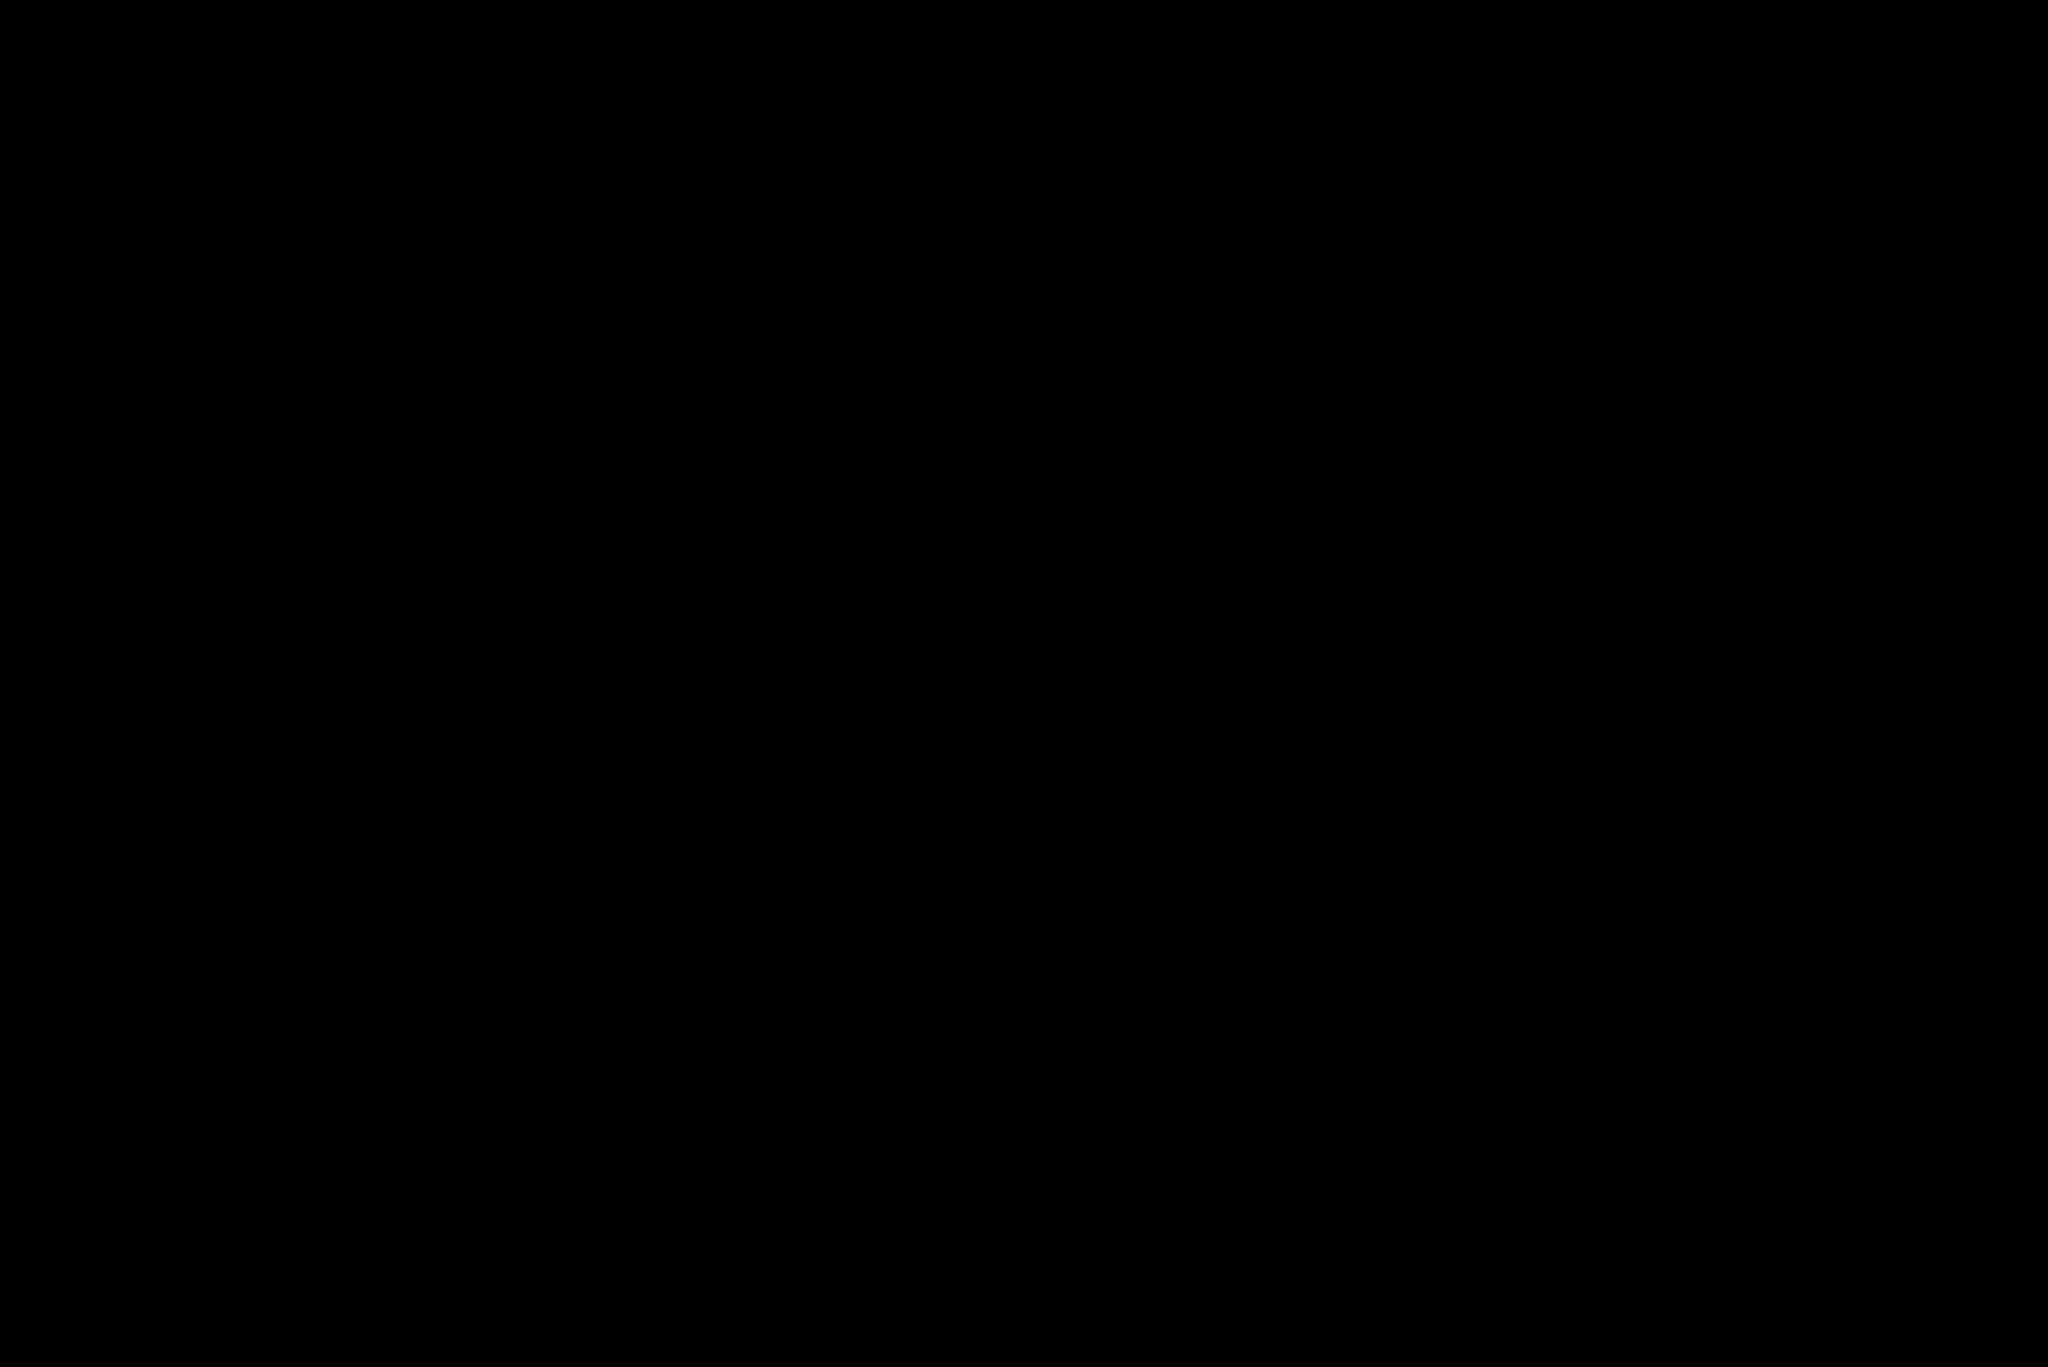 Slakterigatan 6